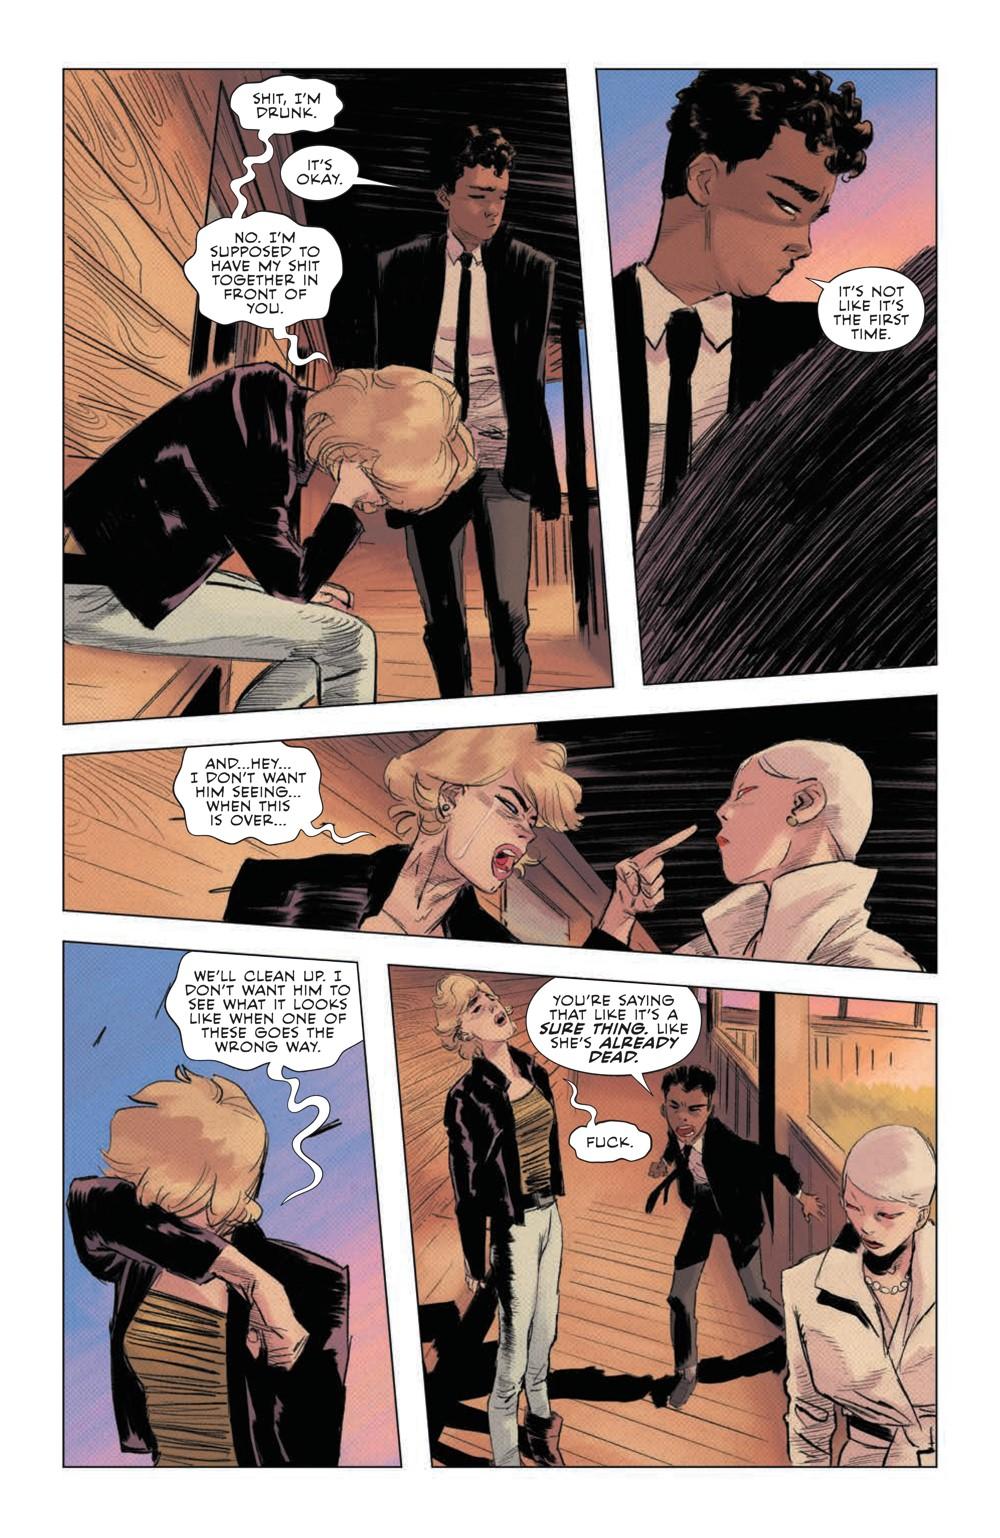 SomethingKillingChildren_020_PRESS_7 ComicList Previews: SOMETHING IS KILLING THE CHILDREN #20